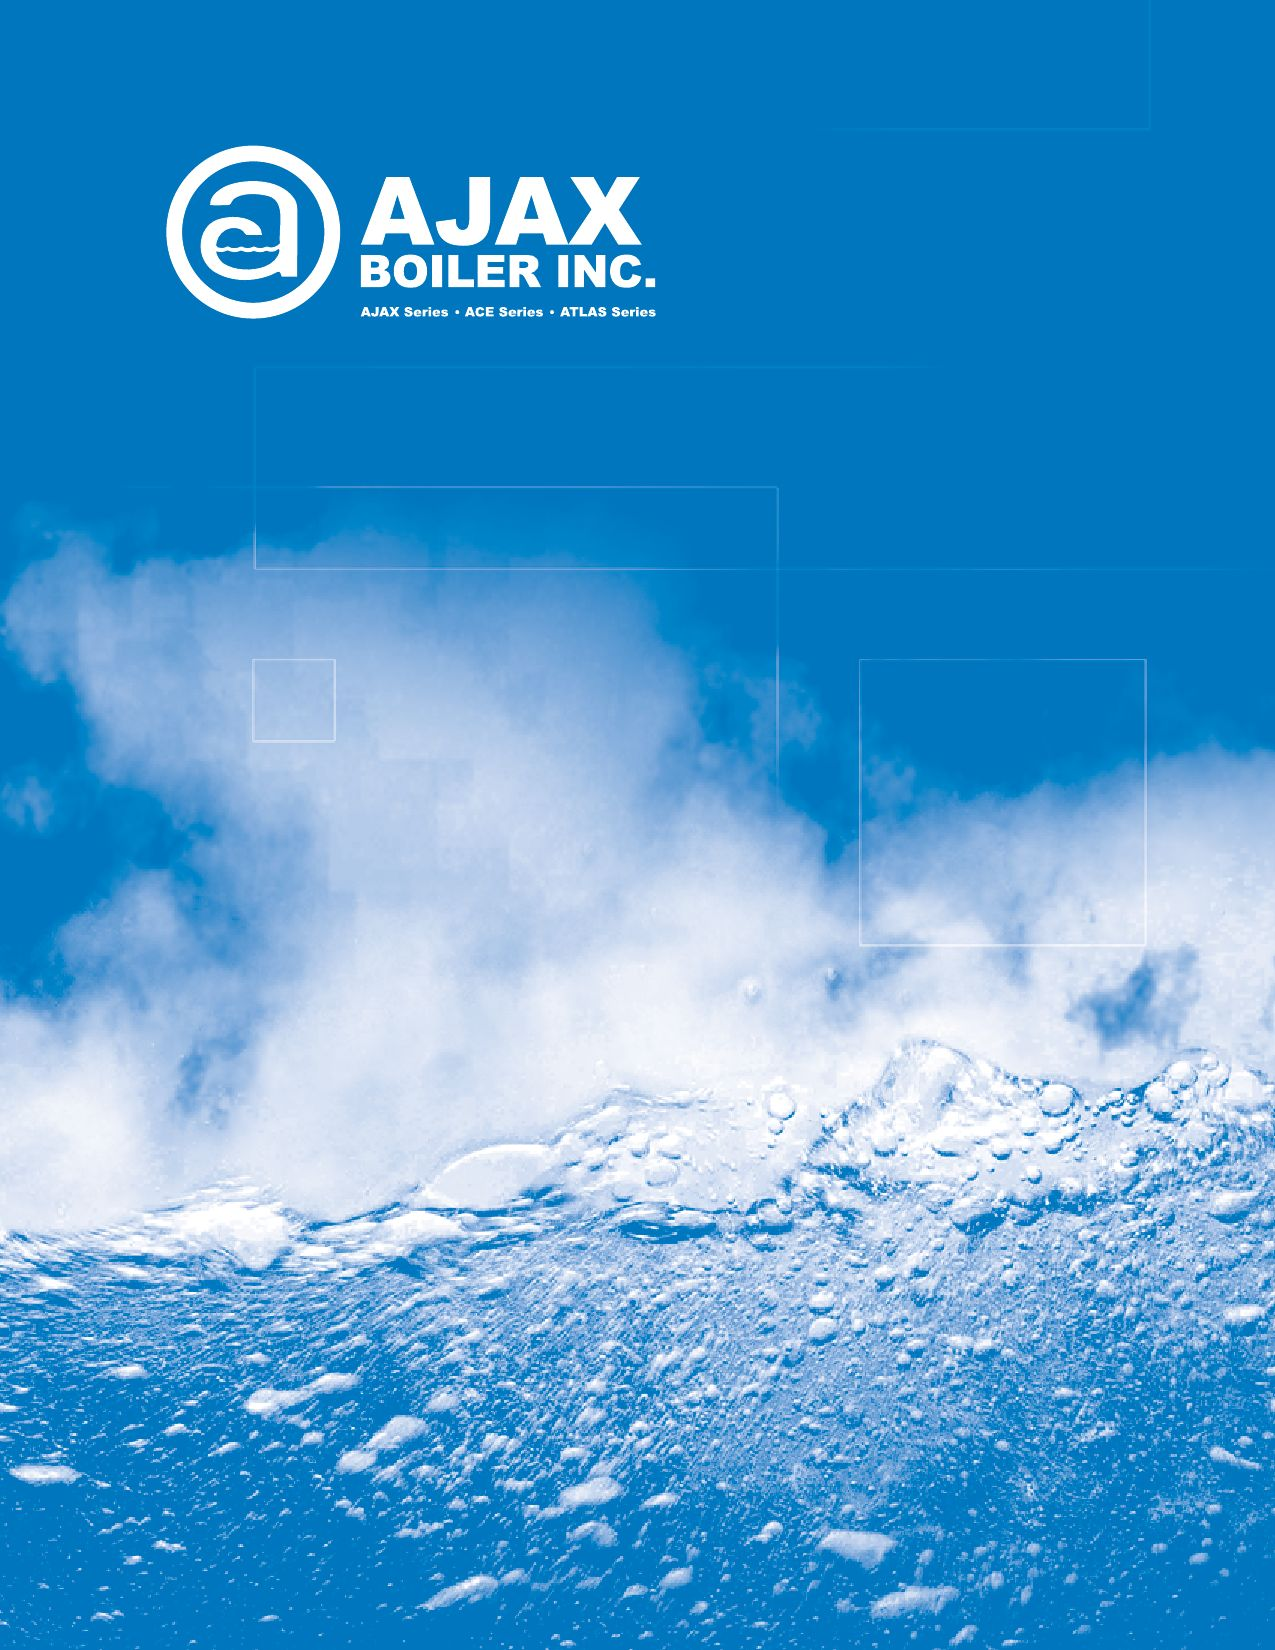 Ajax Boiler Marketing Brochure By Inc Issuu Wiring Diagram